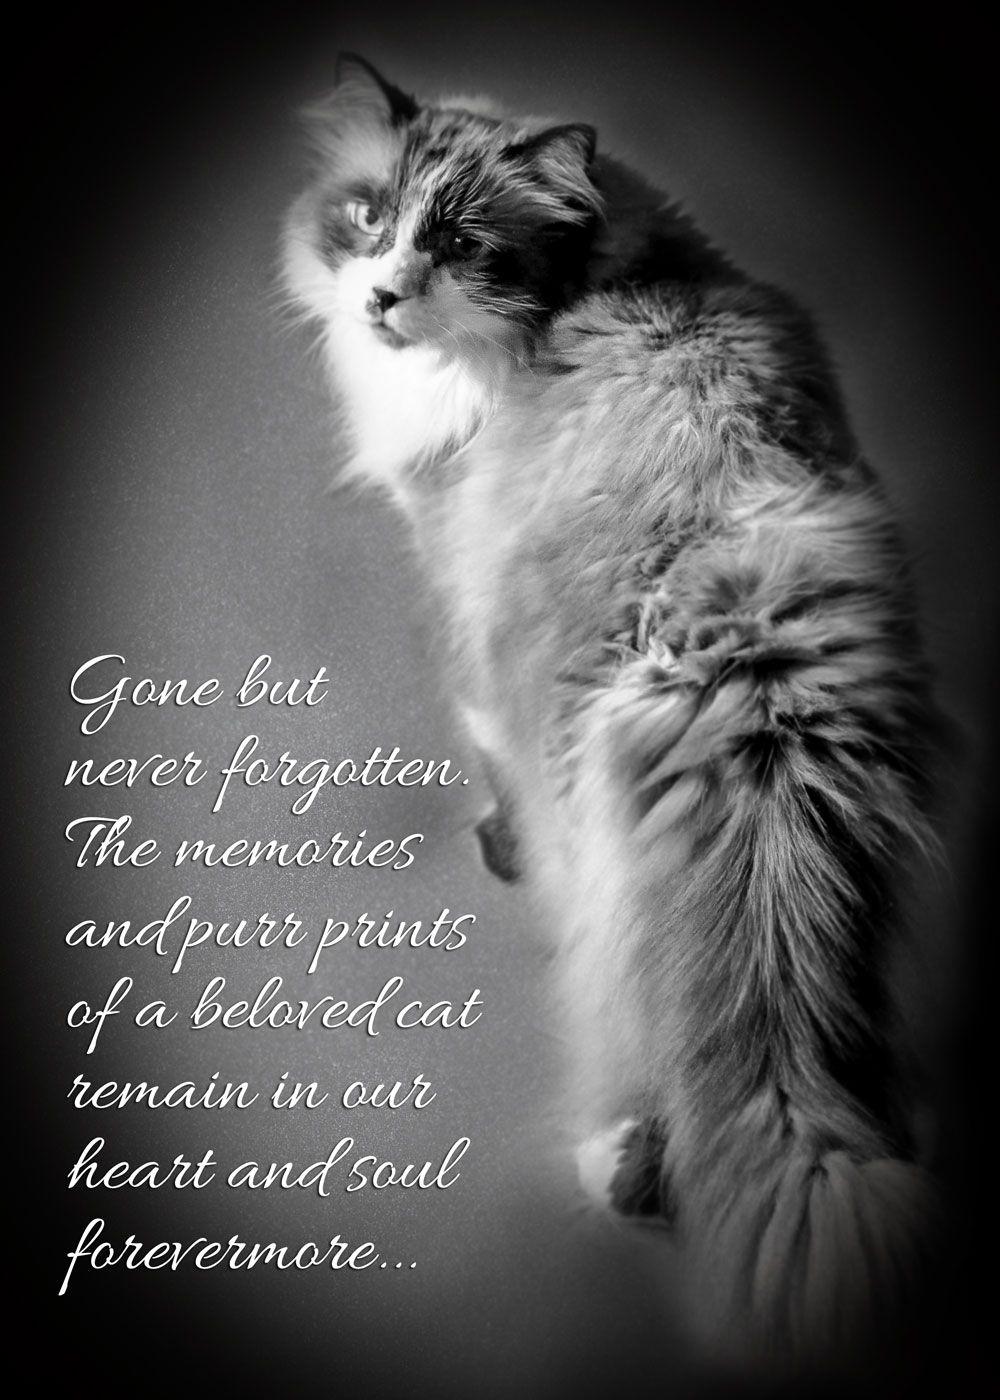 Sympathy card for cat loss | Zazzle.com in 2020 | Cat loss, Pet quotes cat,  Pet loss quotes